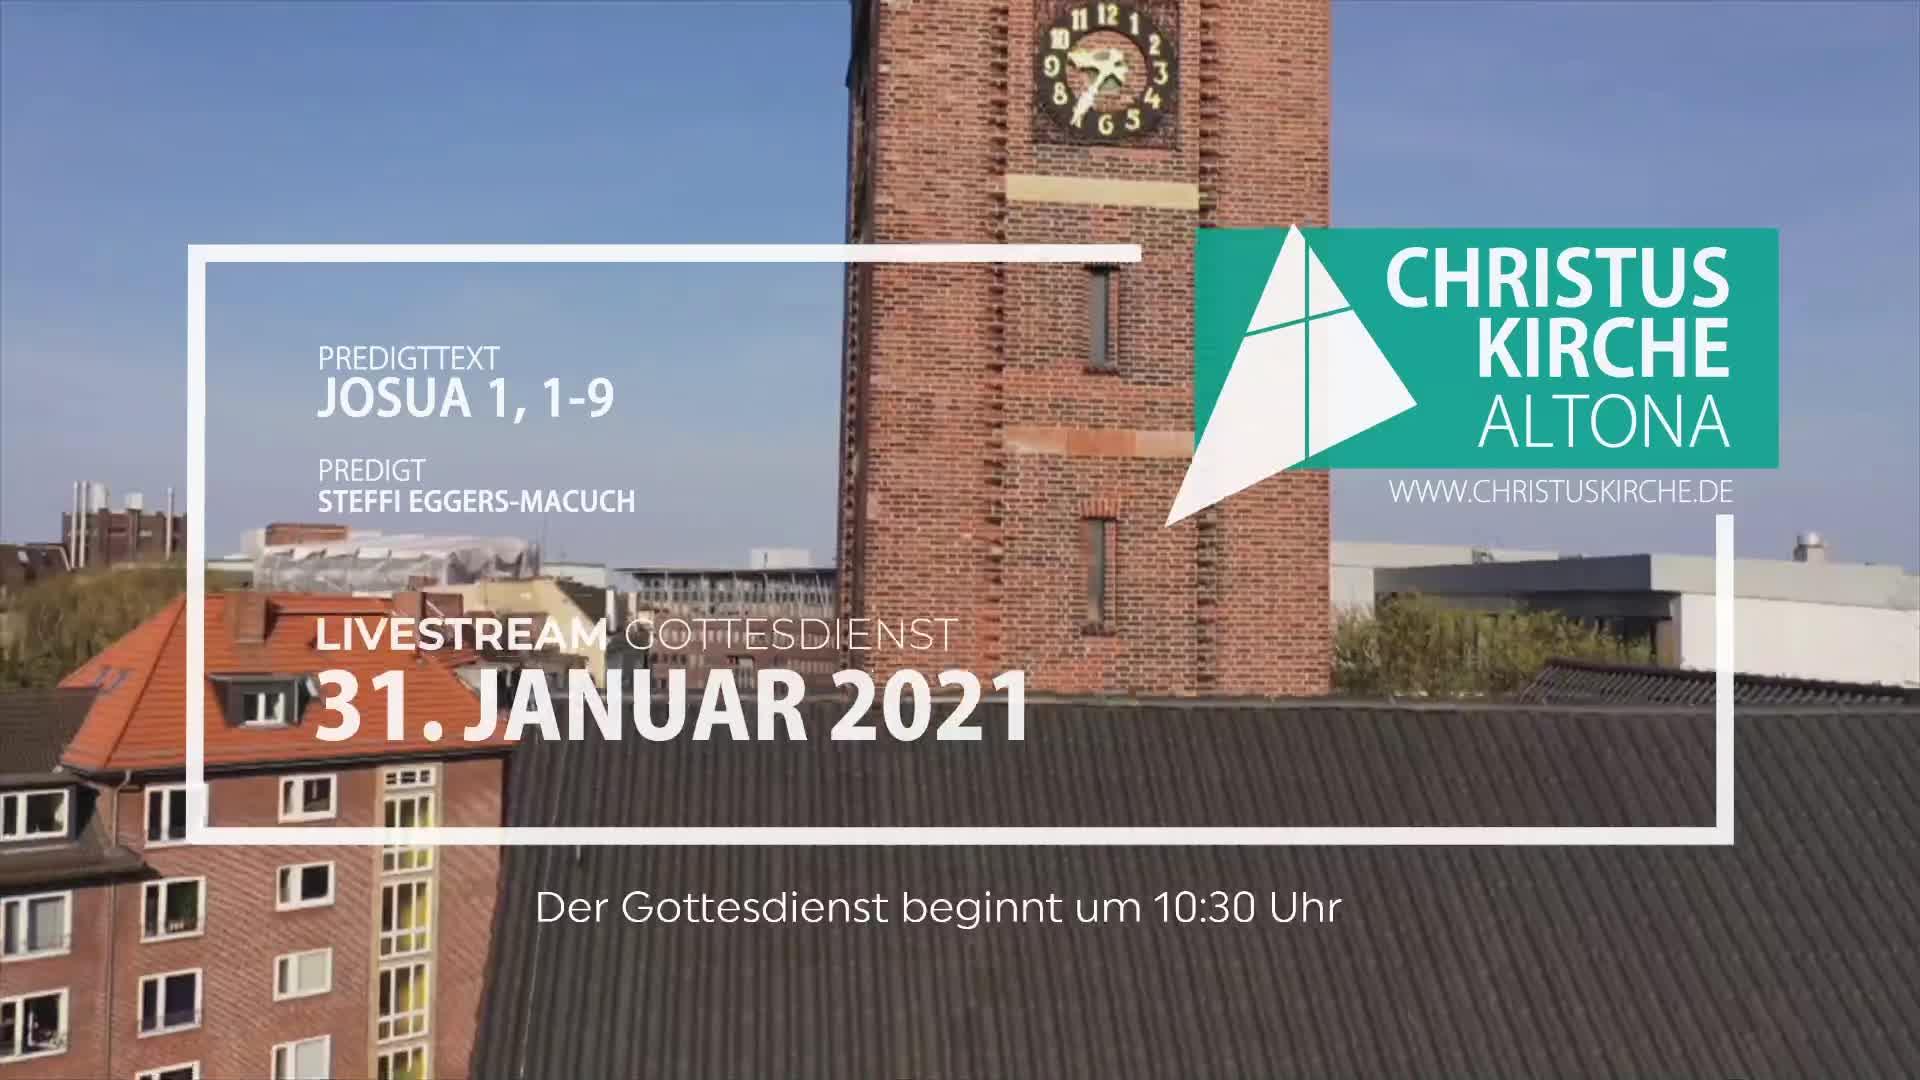 Gottesdienst am 31. Januar 2021 - Livestream aus der Christuskirche Altona